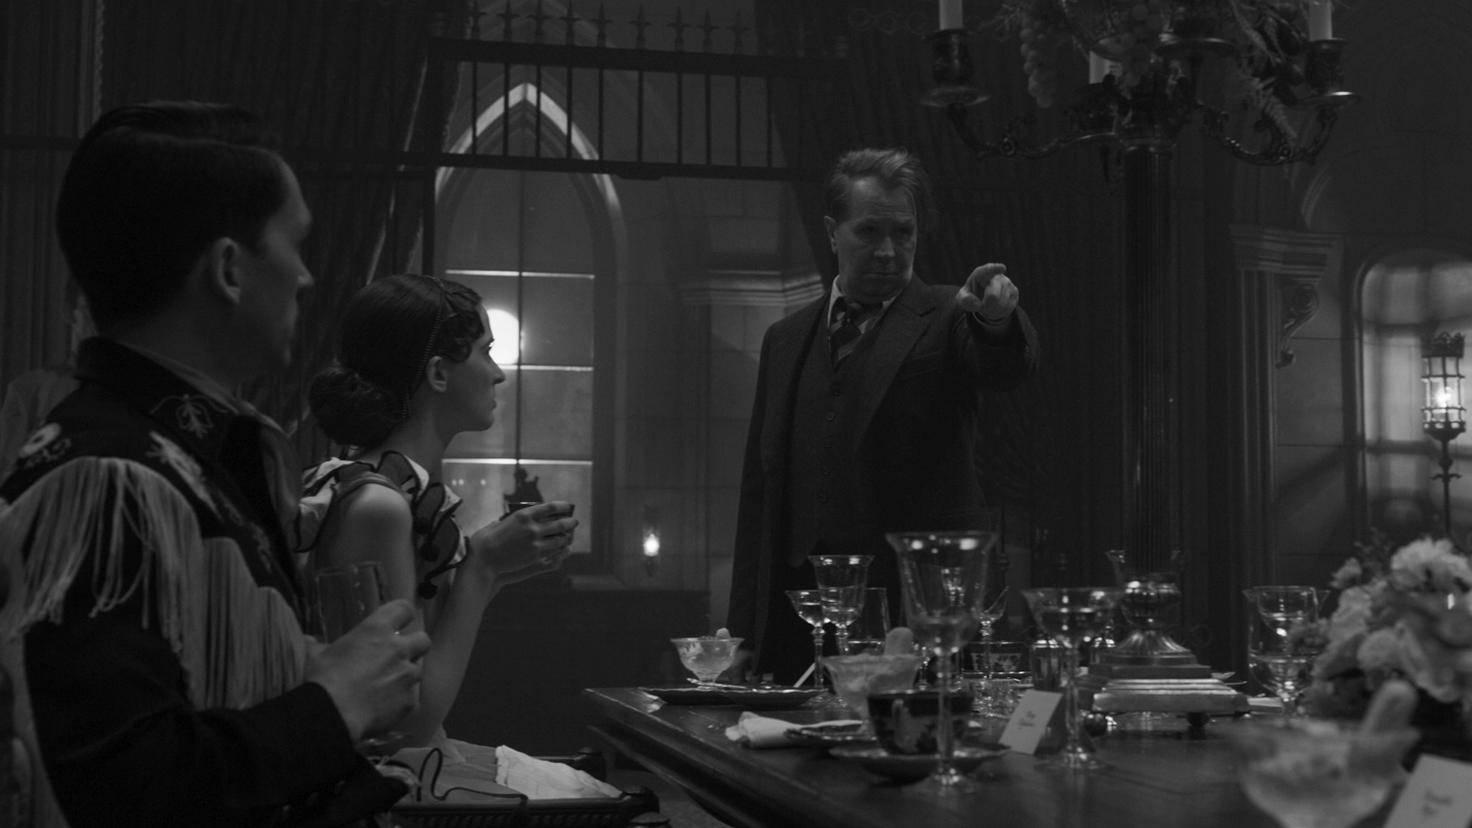 Mank Gary Oldman als Mankiewicz